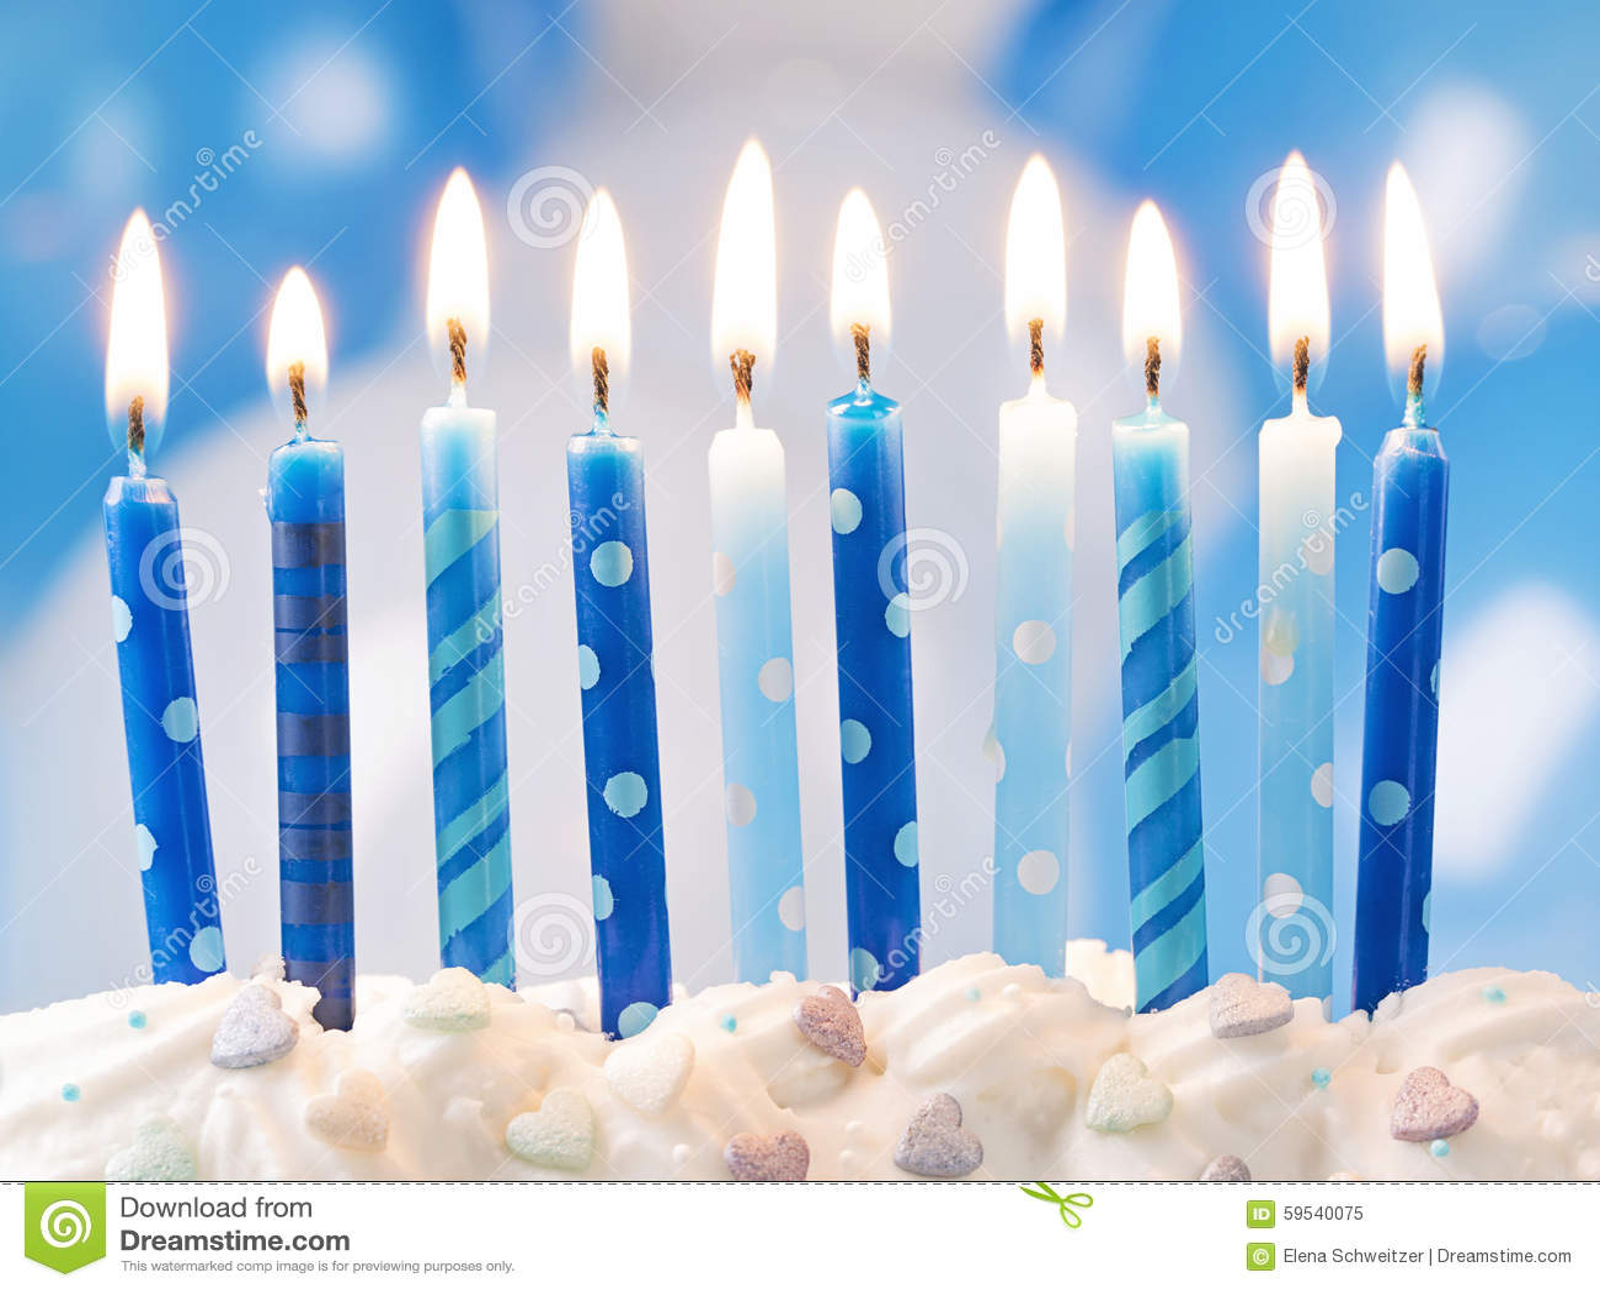 Blue Birthday Candles Stock Photo Image 59540075